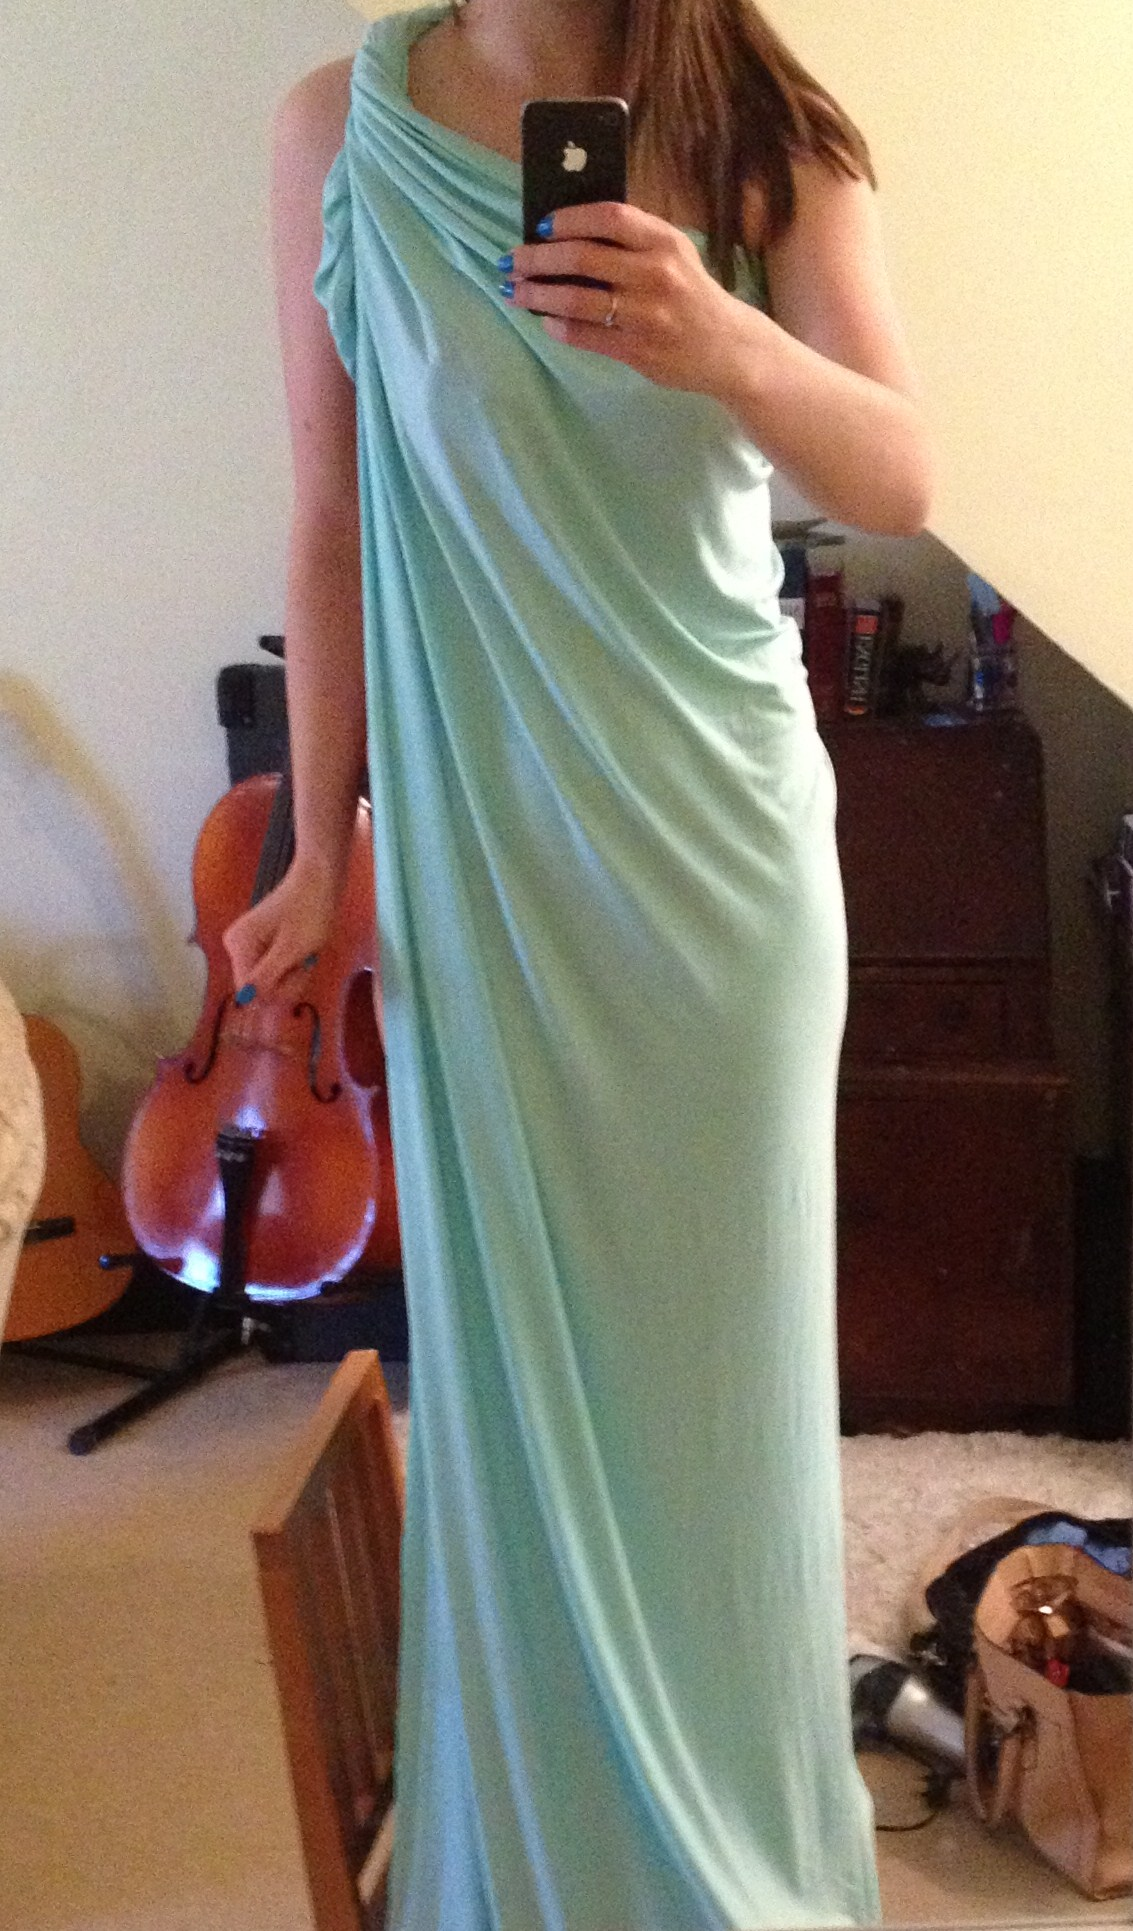 DIY Grecian Maxi Dress - simple 20 min tutorial! - Pauper ...